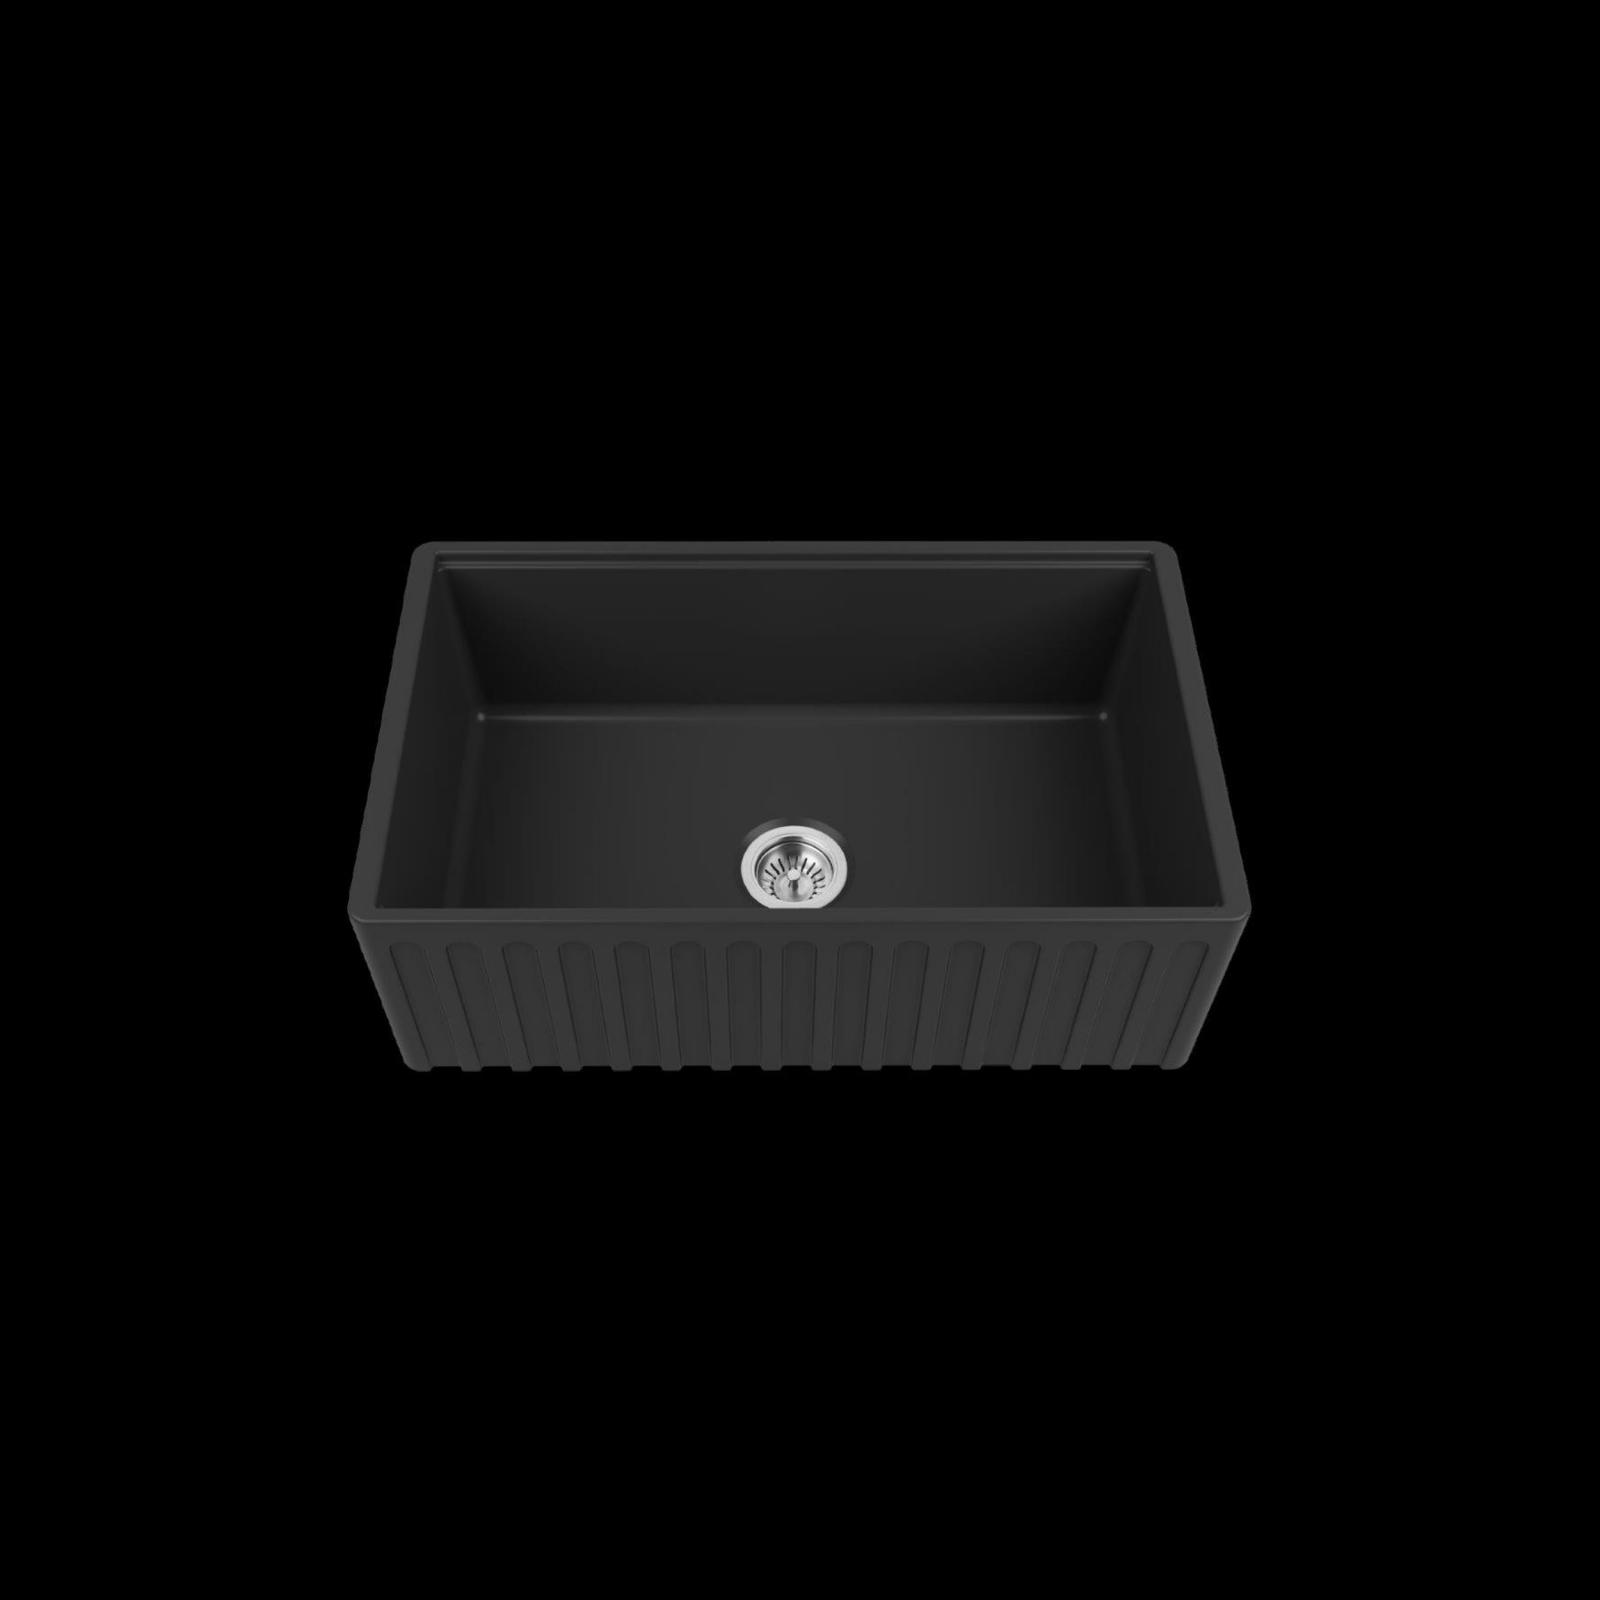 High-quality sink Louis Le Grand I black - single bowl, ceramic